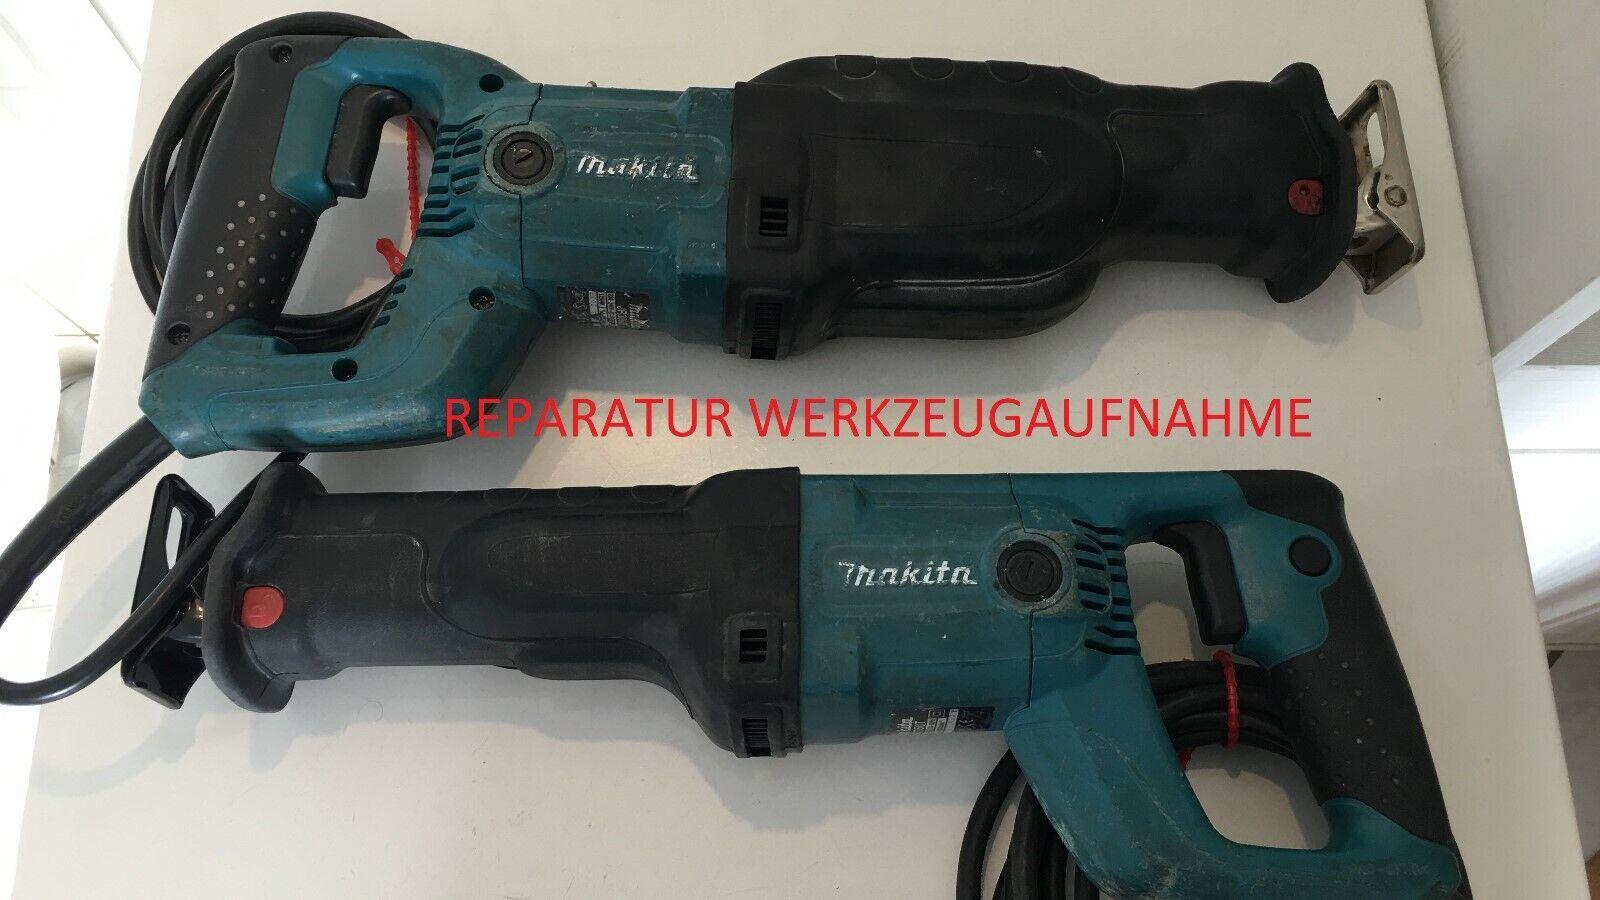 Makita Säbelsäge, Tigersäge, Reparatur der Werkzeugaufnahme, JR3050T 60T 70CT